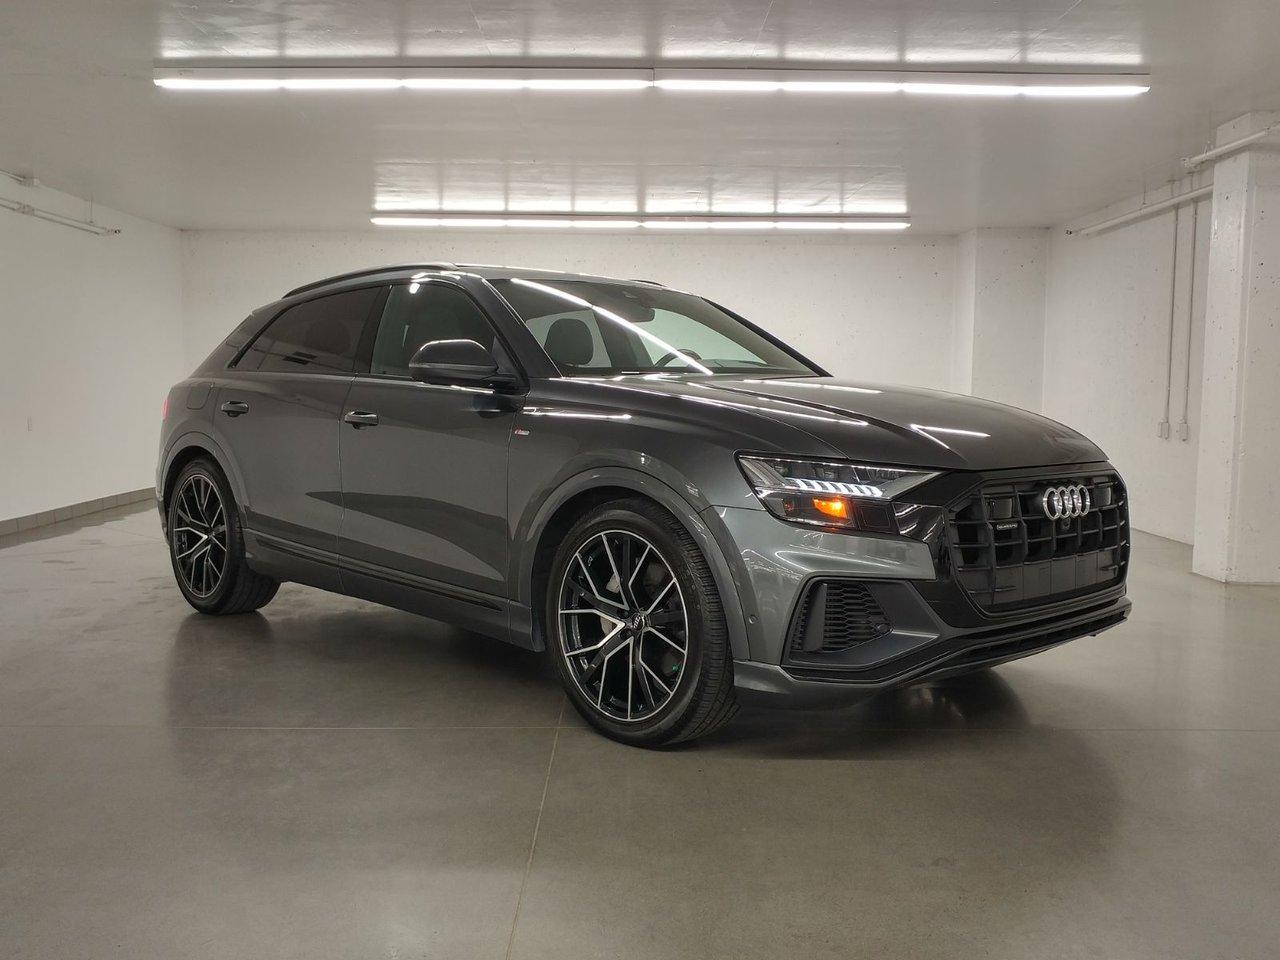 Audi Q8 2019 TECHNIK S-LINE DRIVER ASSIST | DYNAMIC RIDE |